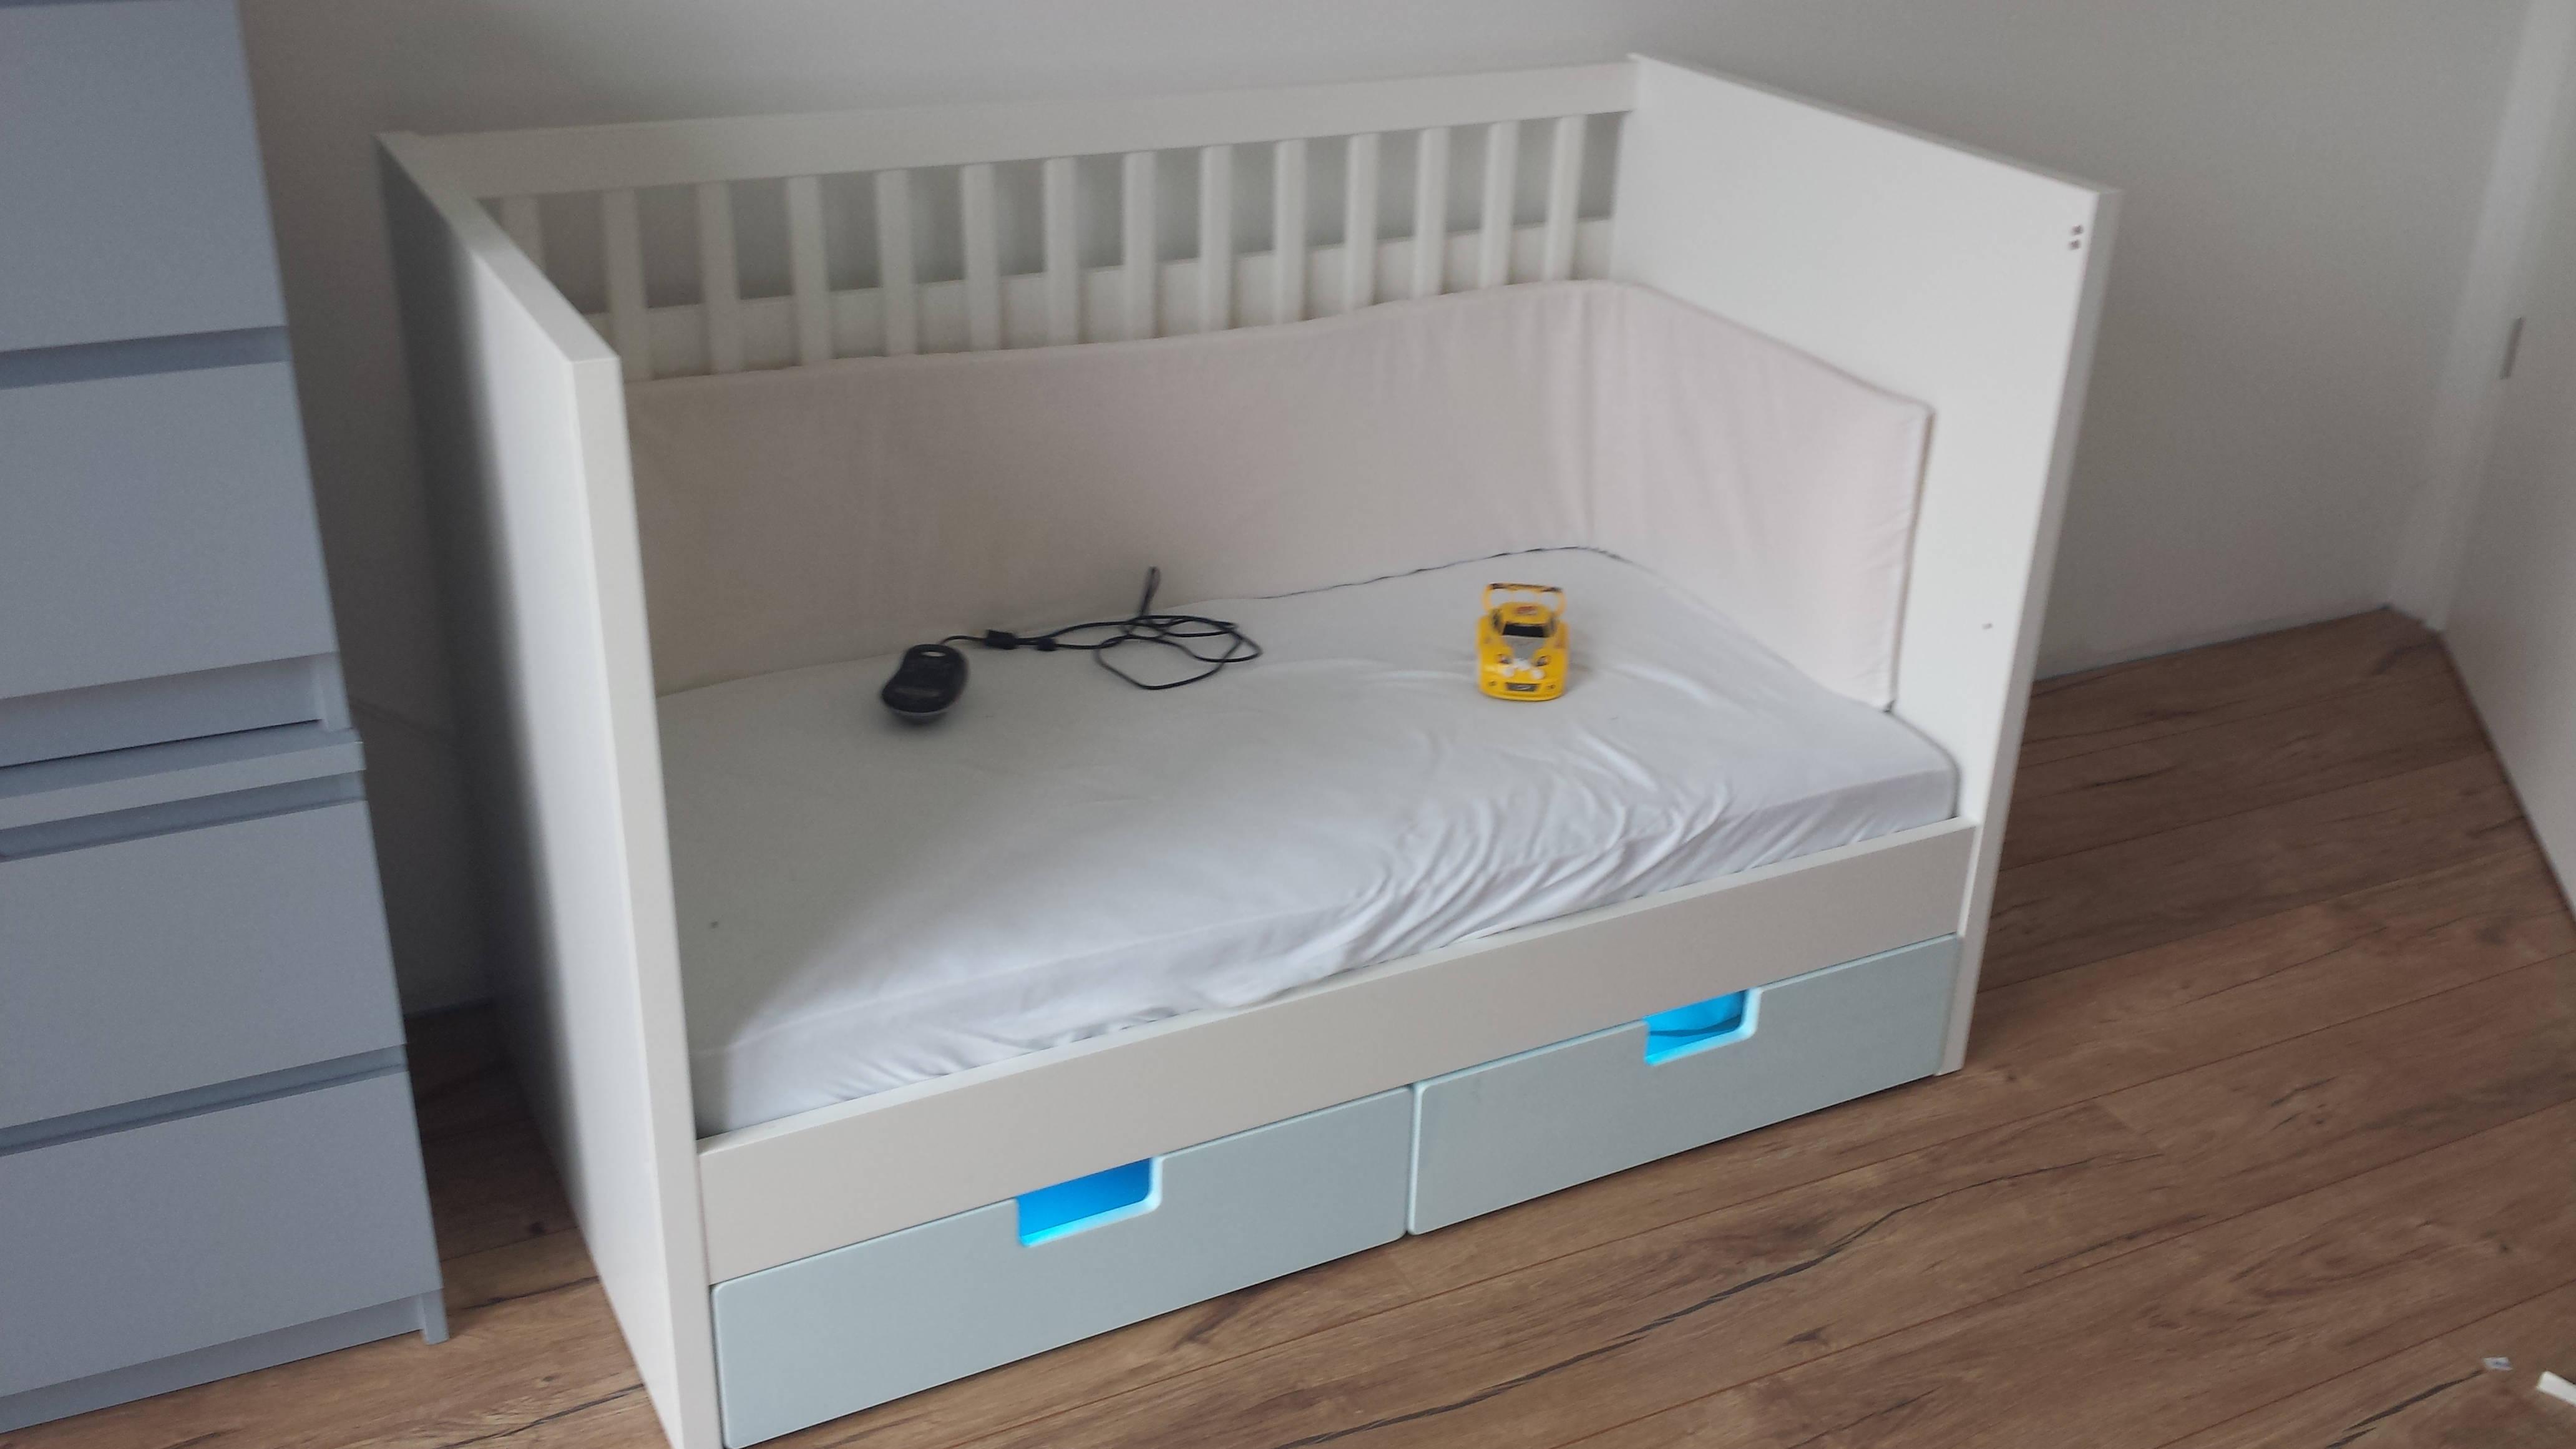 ikea babybett himmelstange f r ikea babybett stuva befestigung himmel babybett gulliver von. Black Bedroom Furniture Sets. Home Design Ideas